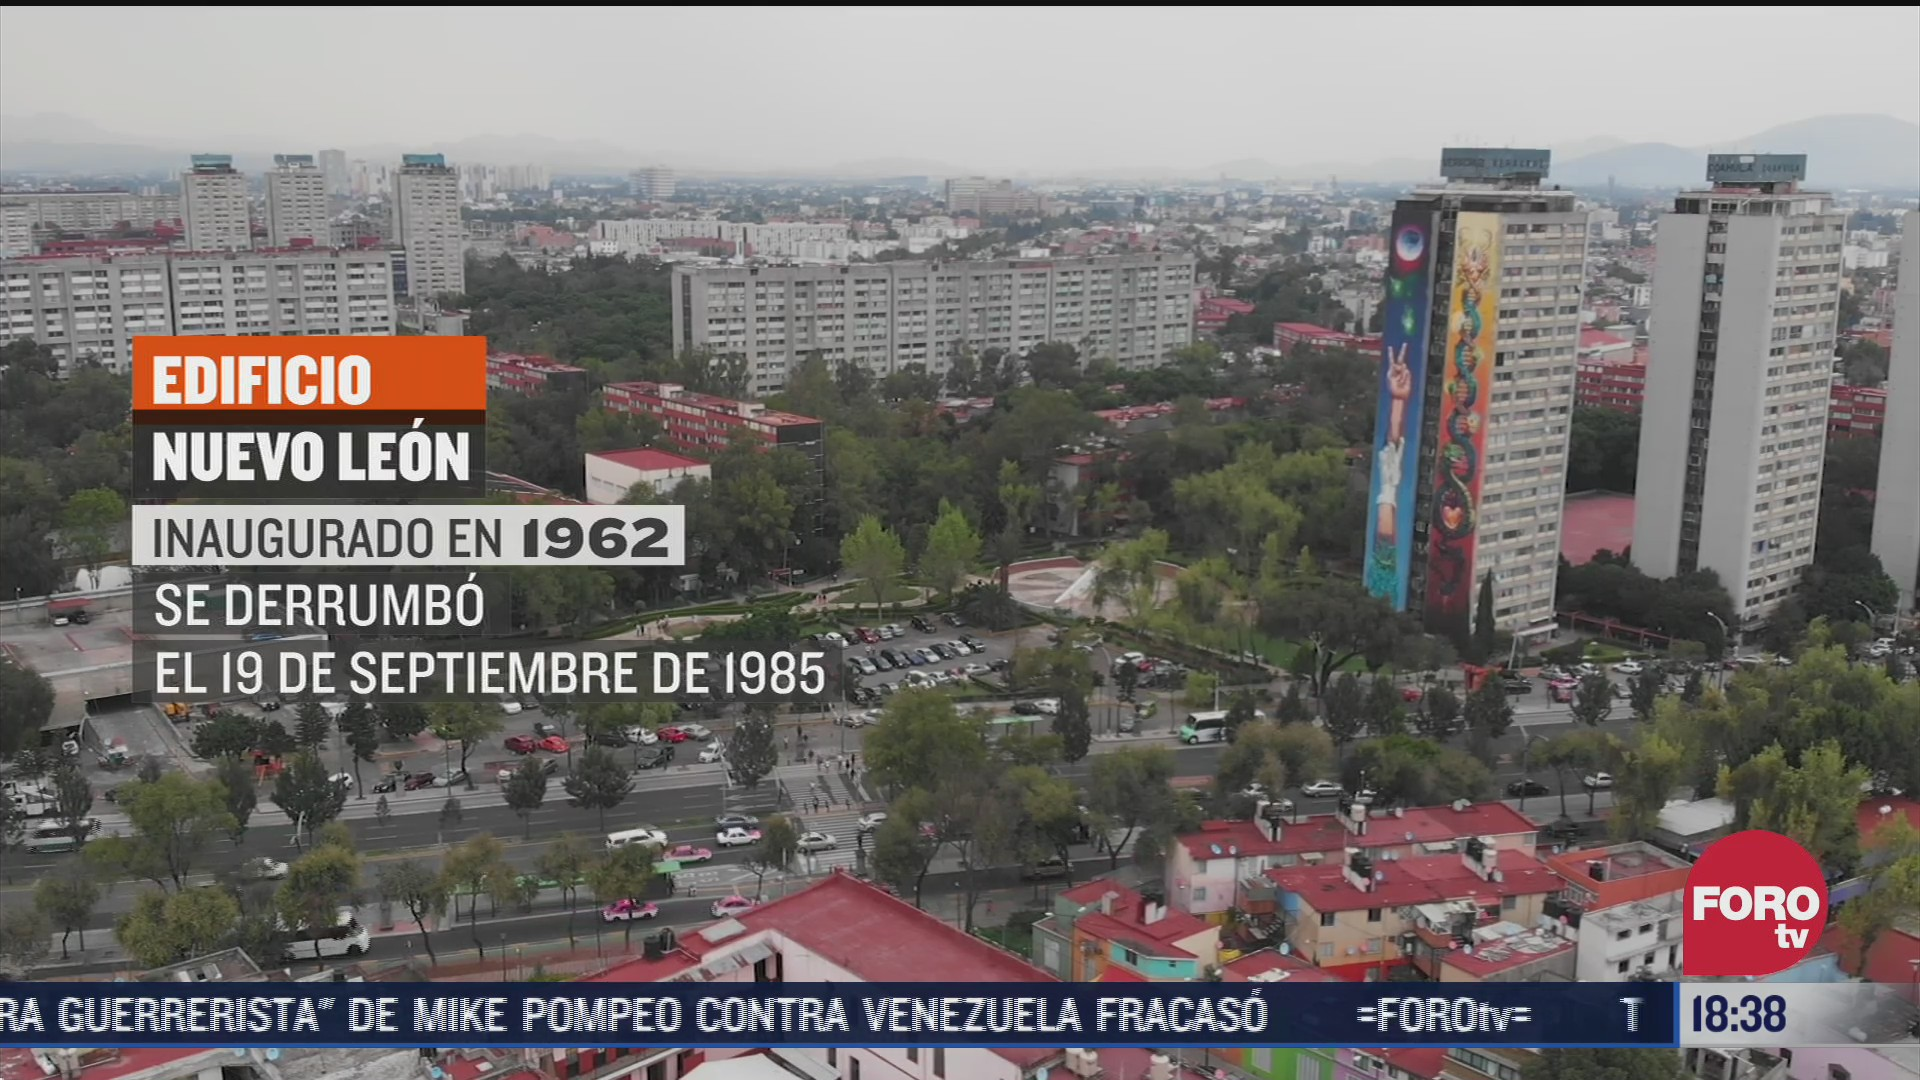 sismo de 1985 derrumbo edificio nuevo leon en tlatelolco